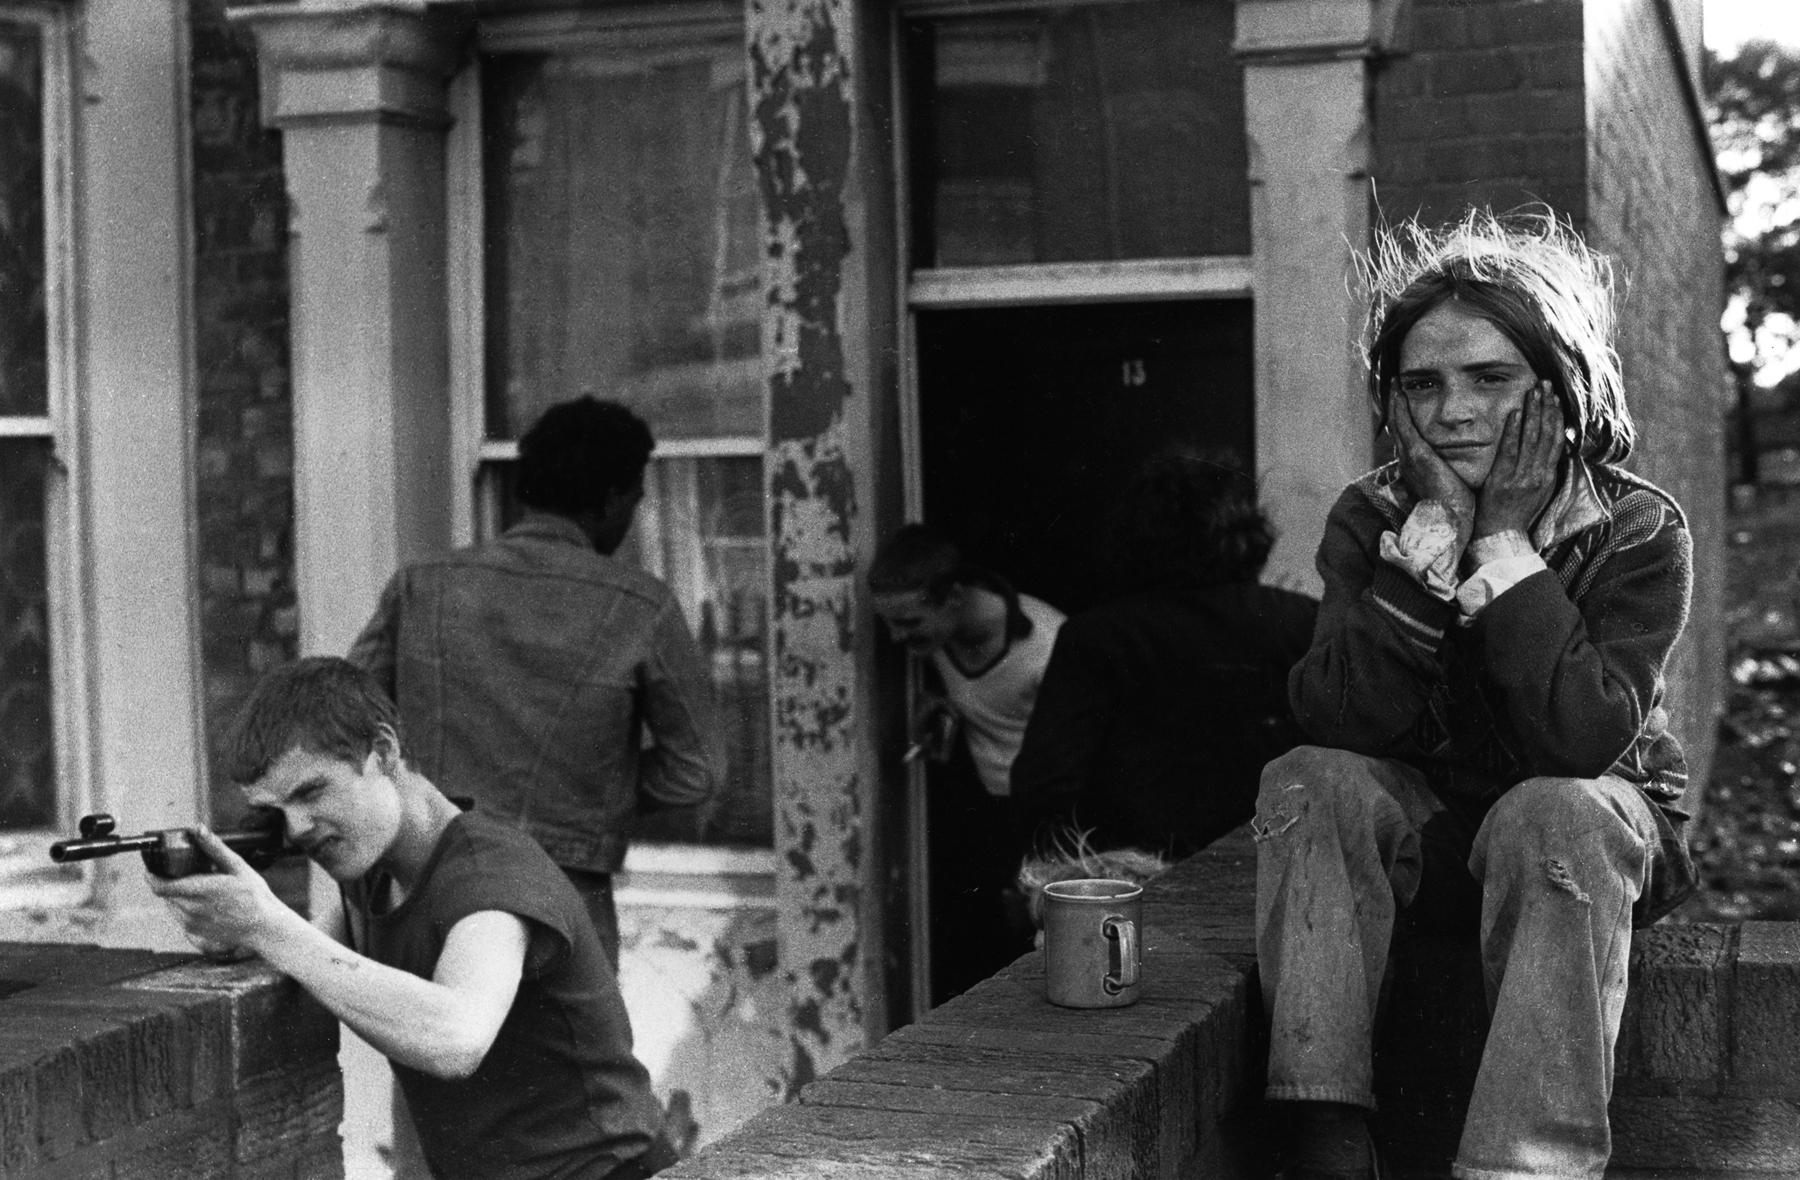 Youth Unemployment  by Tish Murtha, 1981